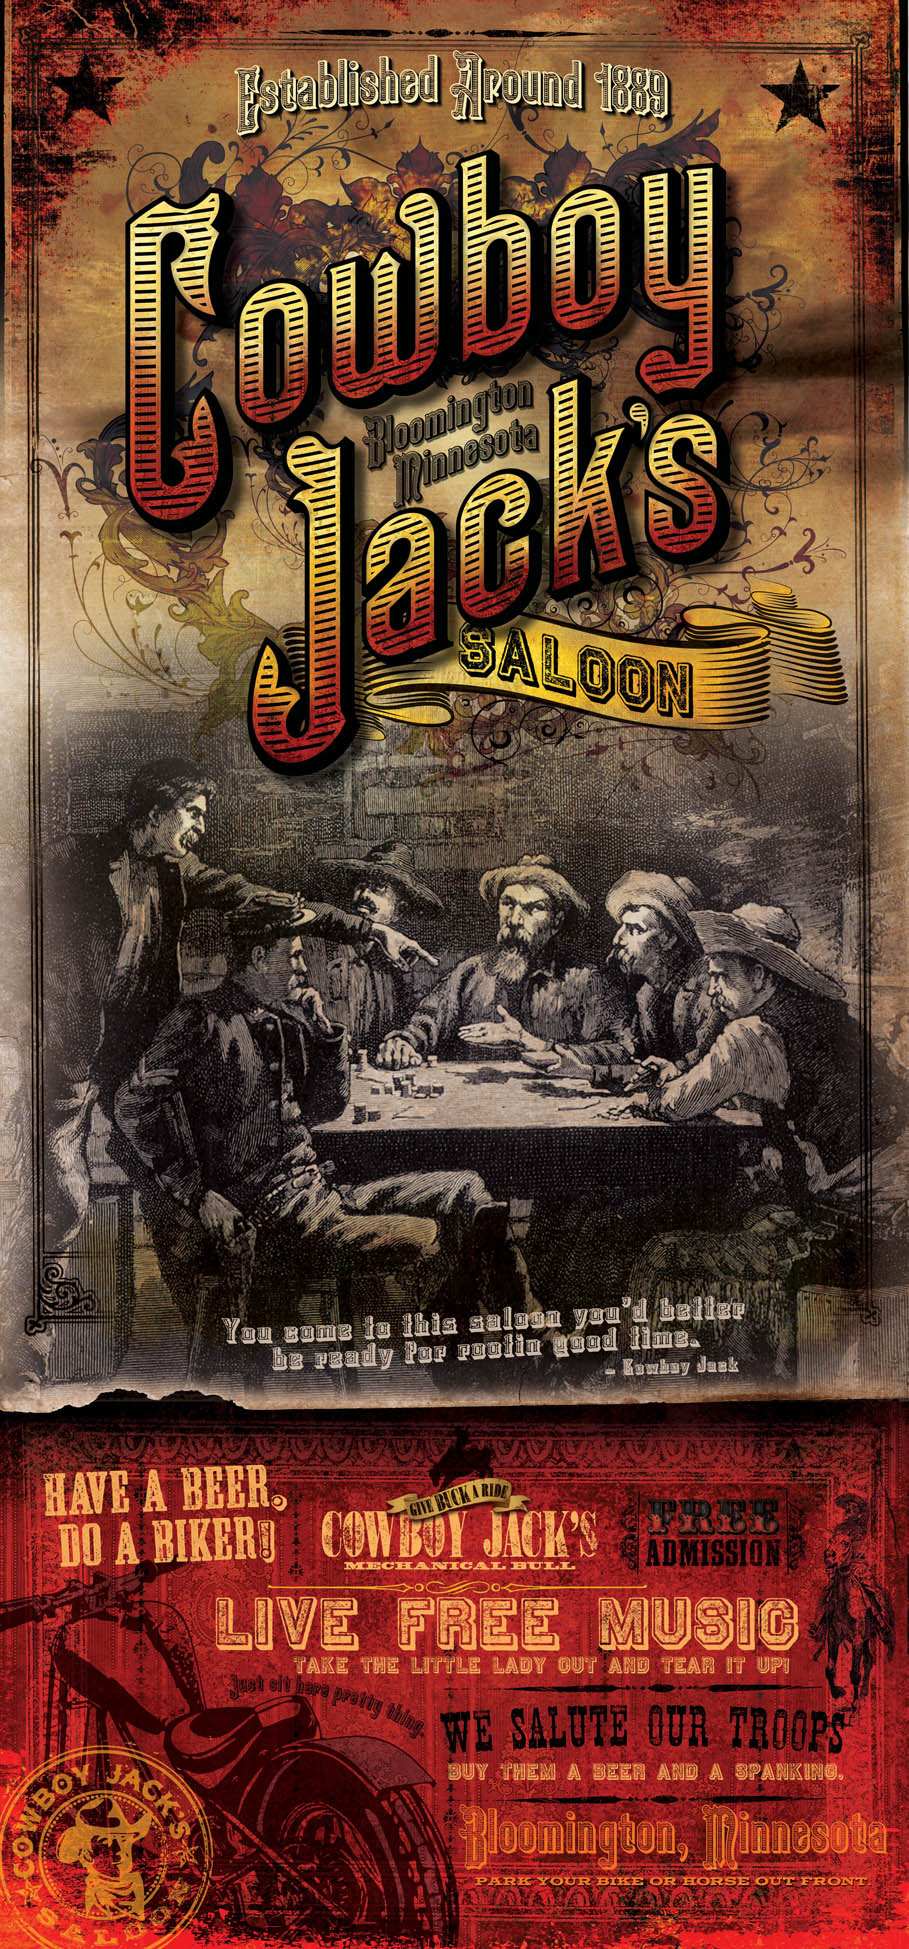 CowboyJacks Poster.jpg